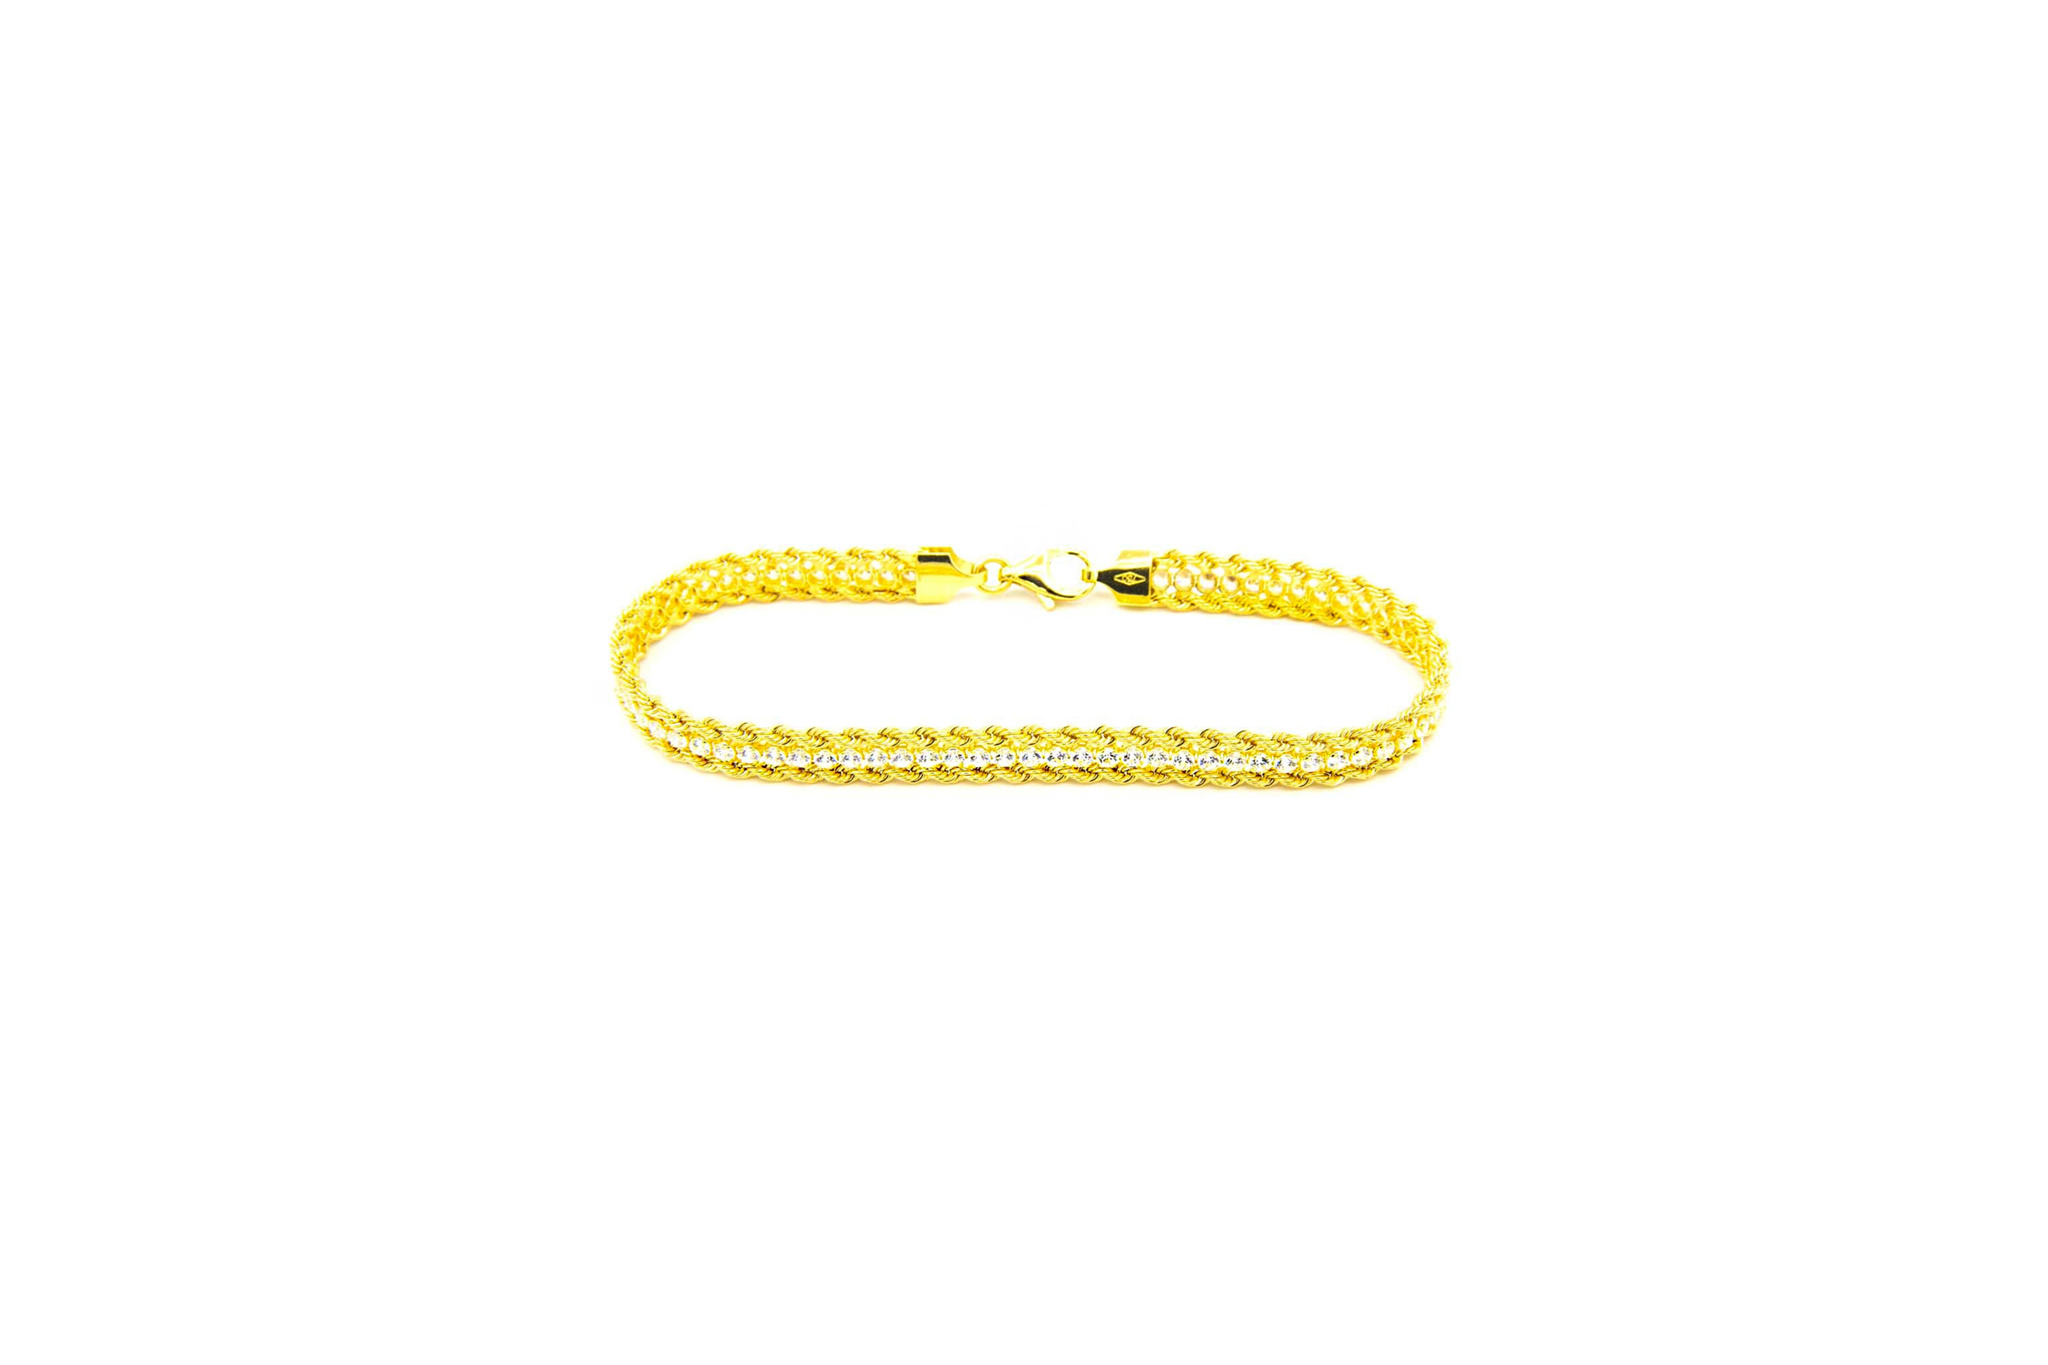 Armband dubbele rope chain met zirkonia's ertussen-1